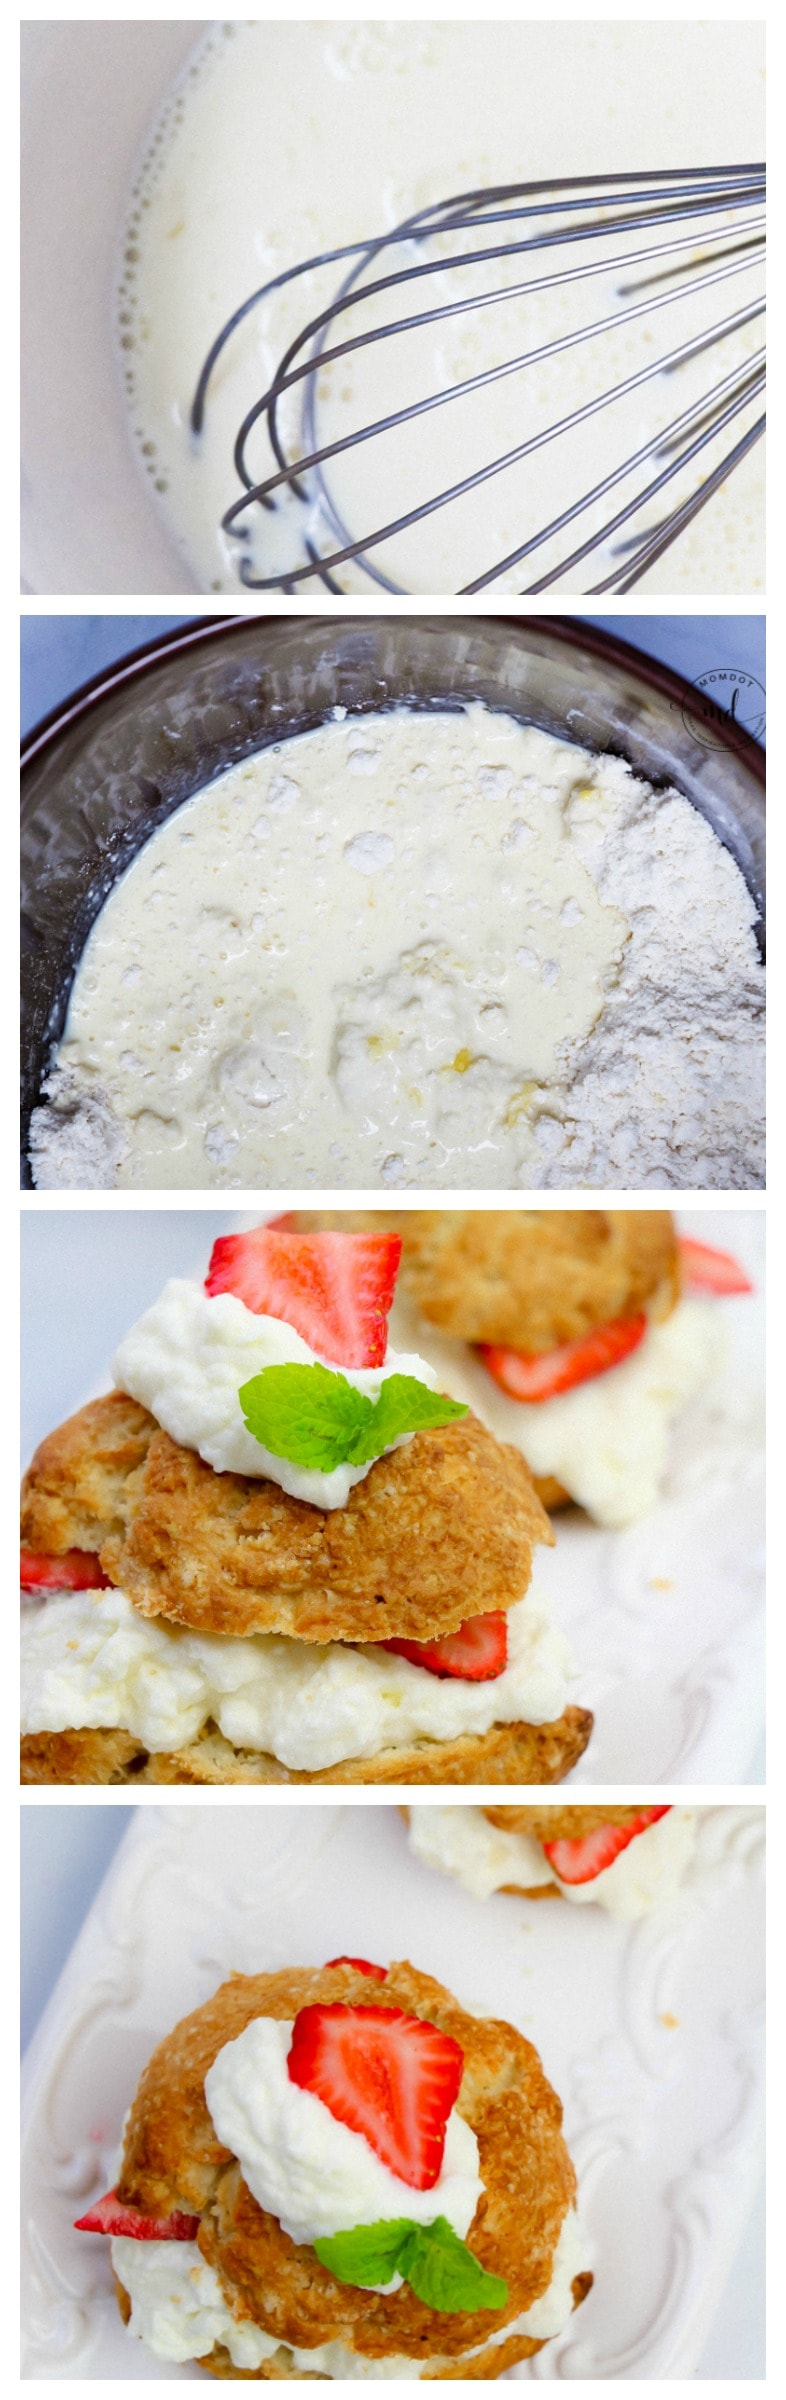 Simple Strawberry Shortcake Recipe   Organic Strawberry Short Cake   Dense Cake   Homemade whipped cream and strawberry sauce